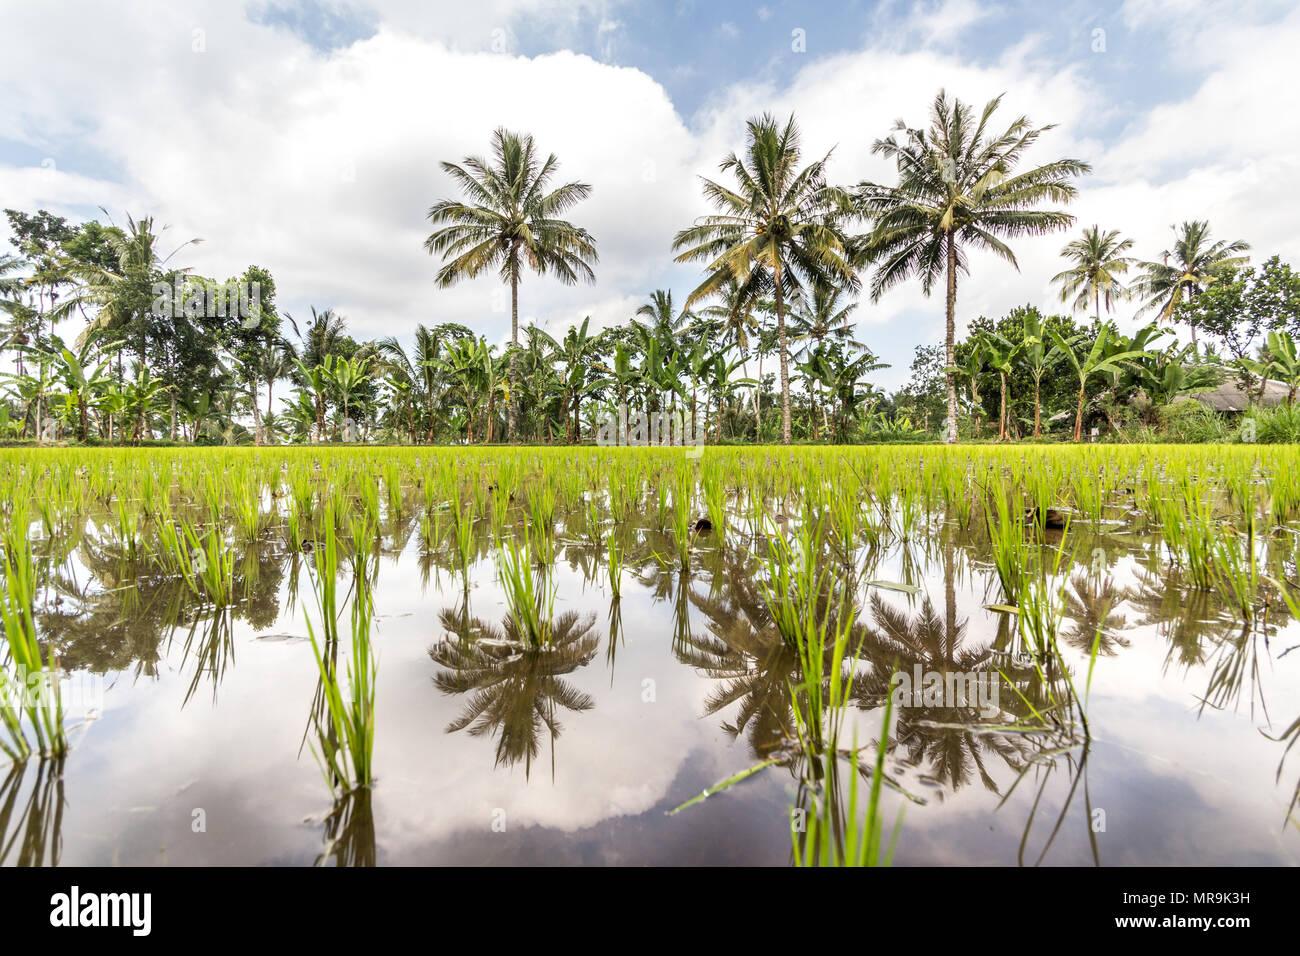 Rice paddies, Indonesia - Stock Image